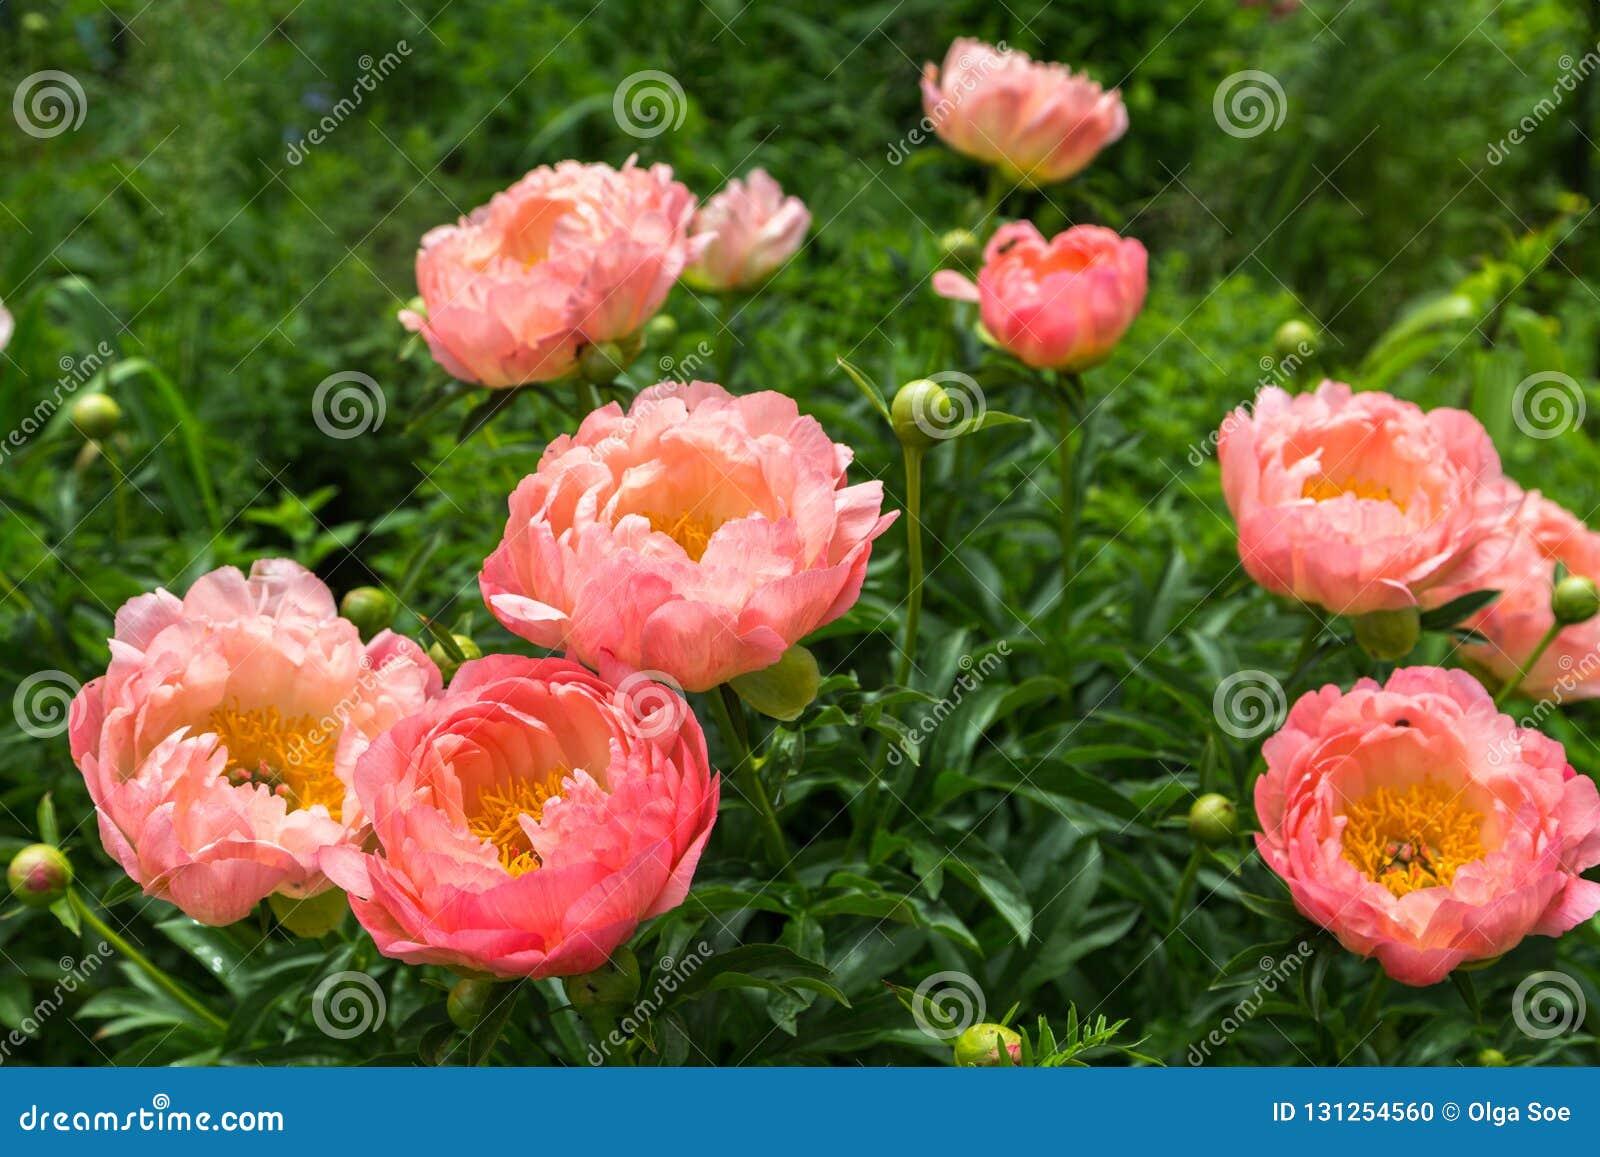 Herbaceous Peonies Pink Hawaiian Coral In Flower Stock Photo